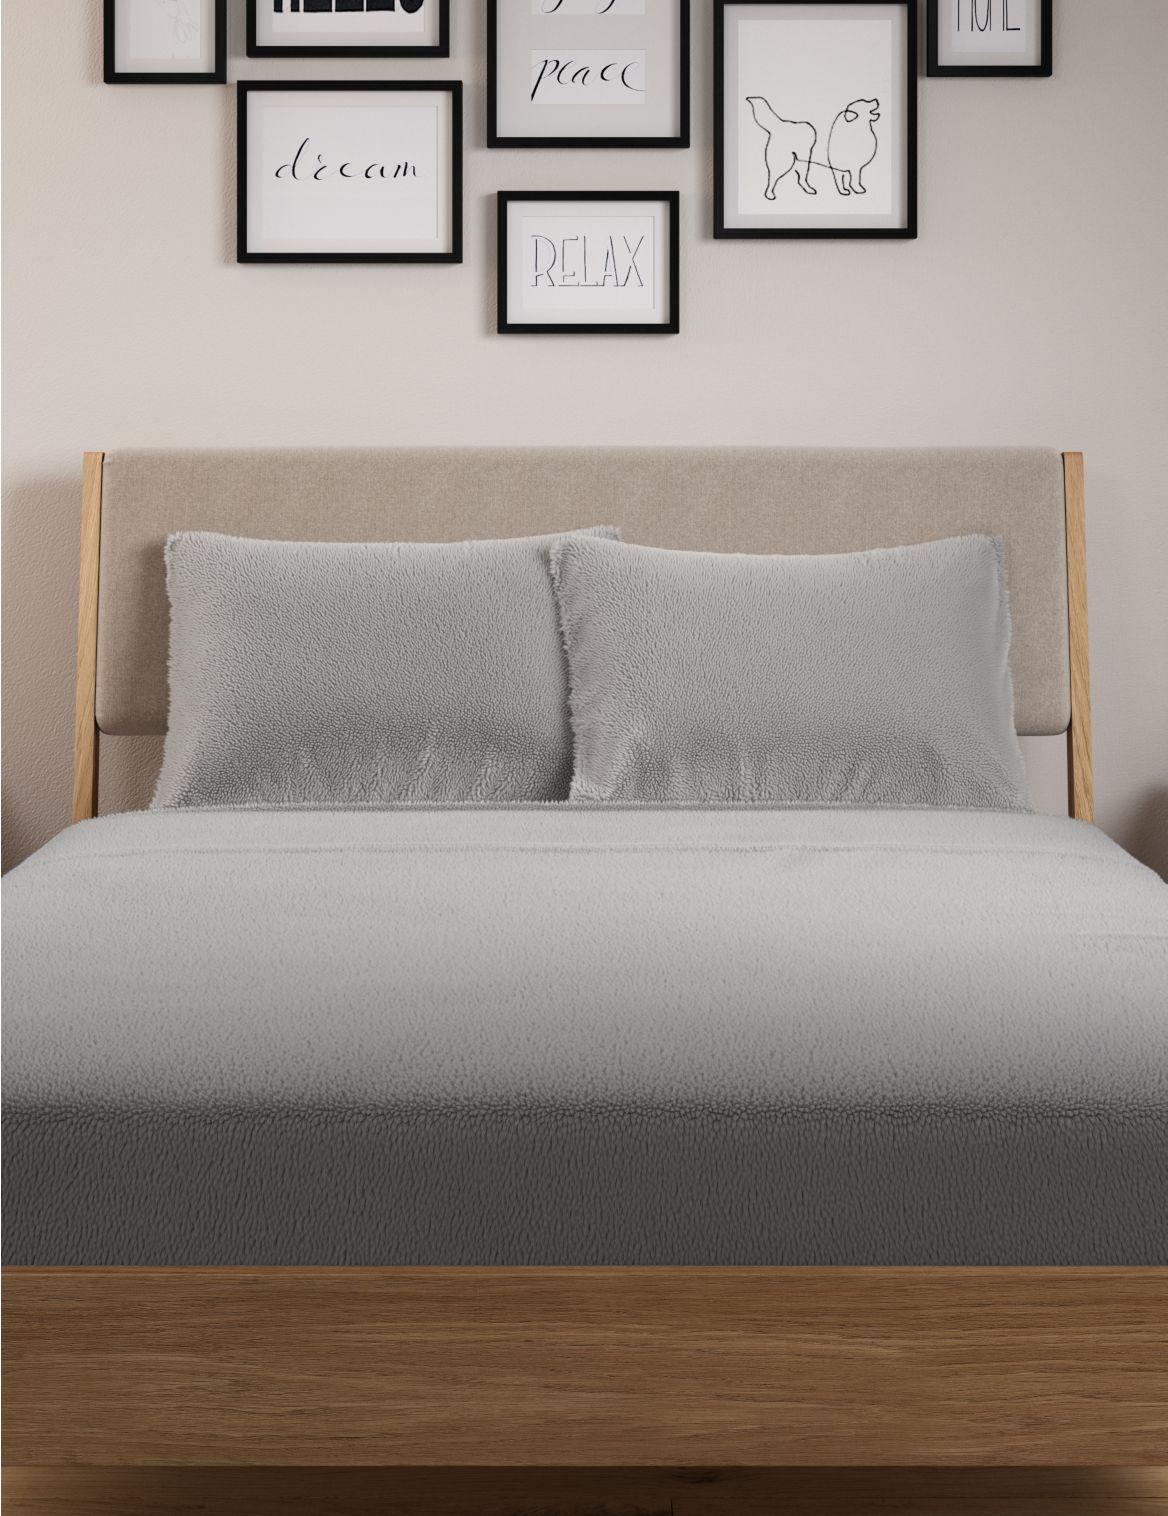 2 Pack Teddy Fleece Standard Pillowcases Grey